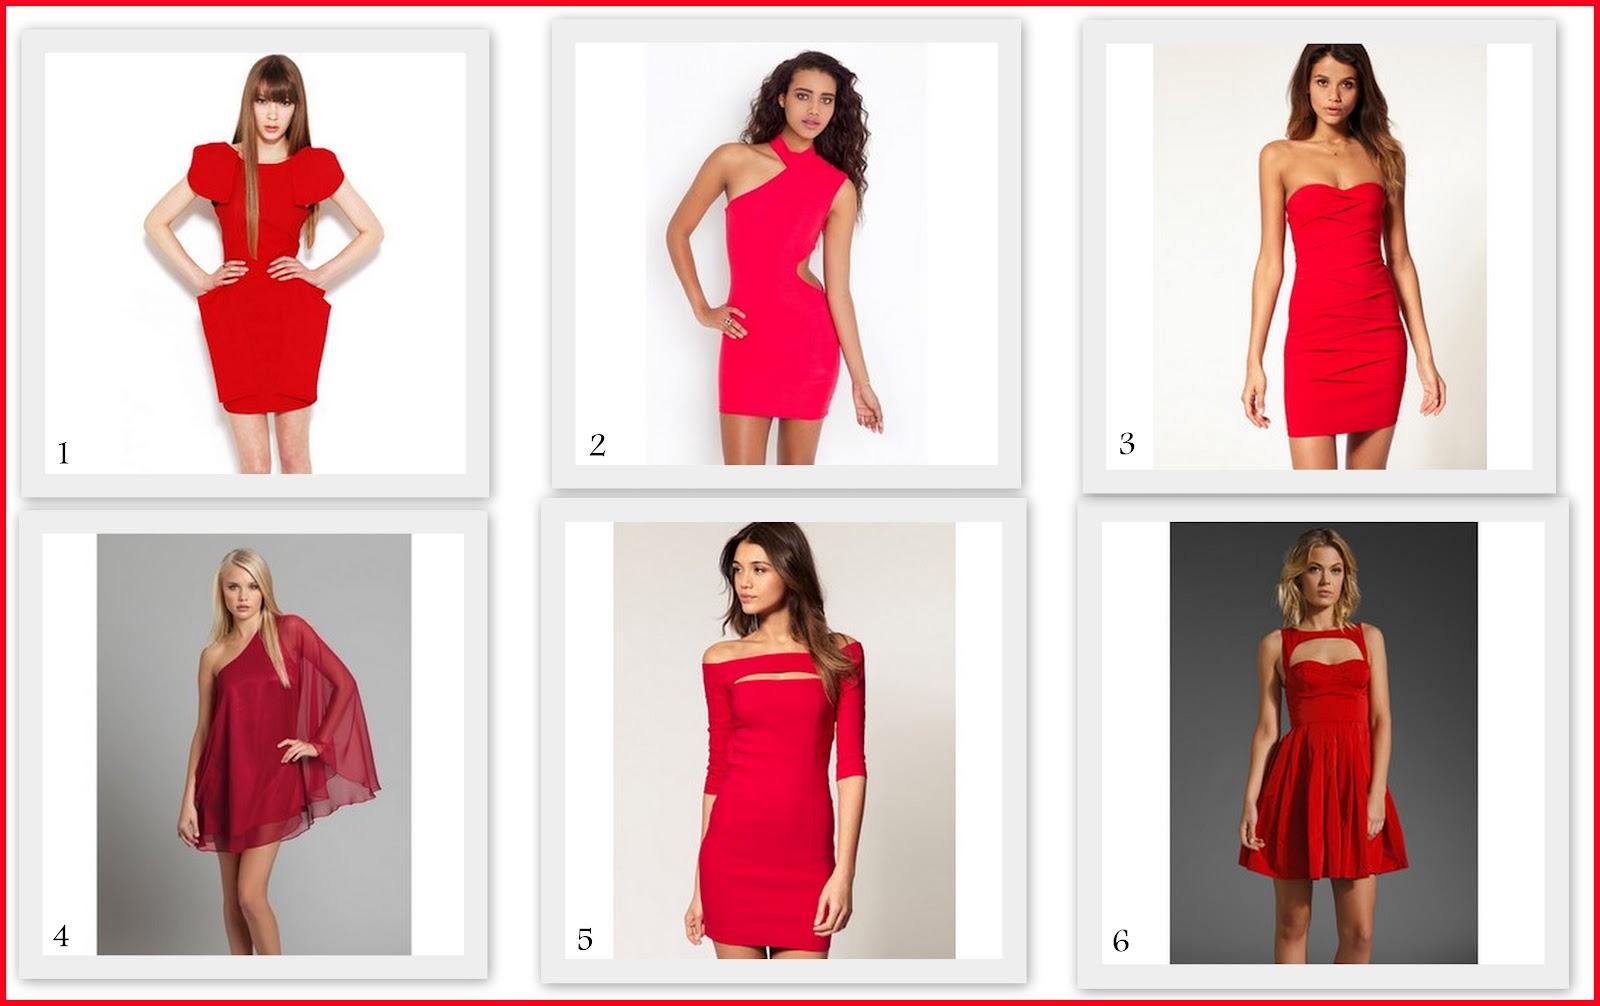 valentines day dresses idea 2013 gift idea for hergirl friend - Girls Valentine Dress